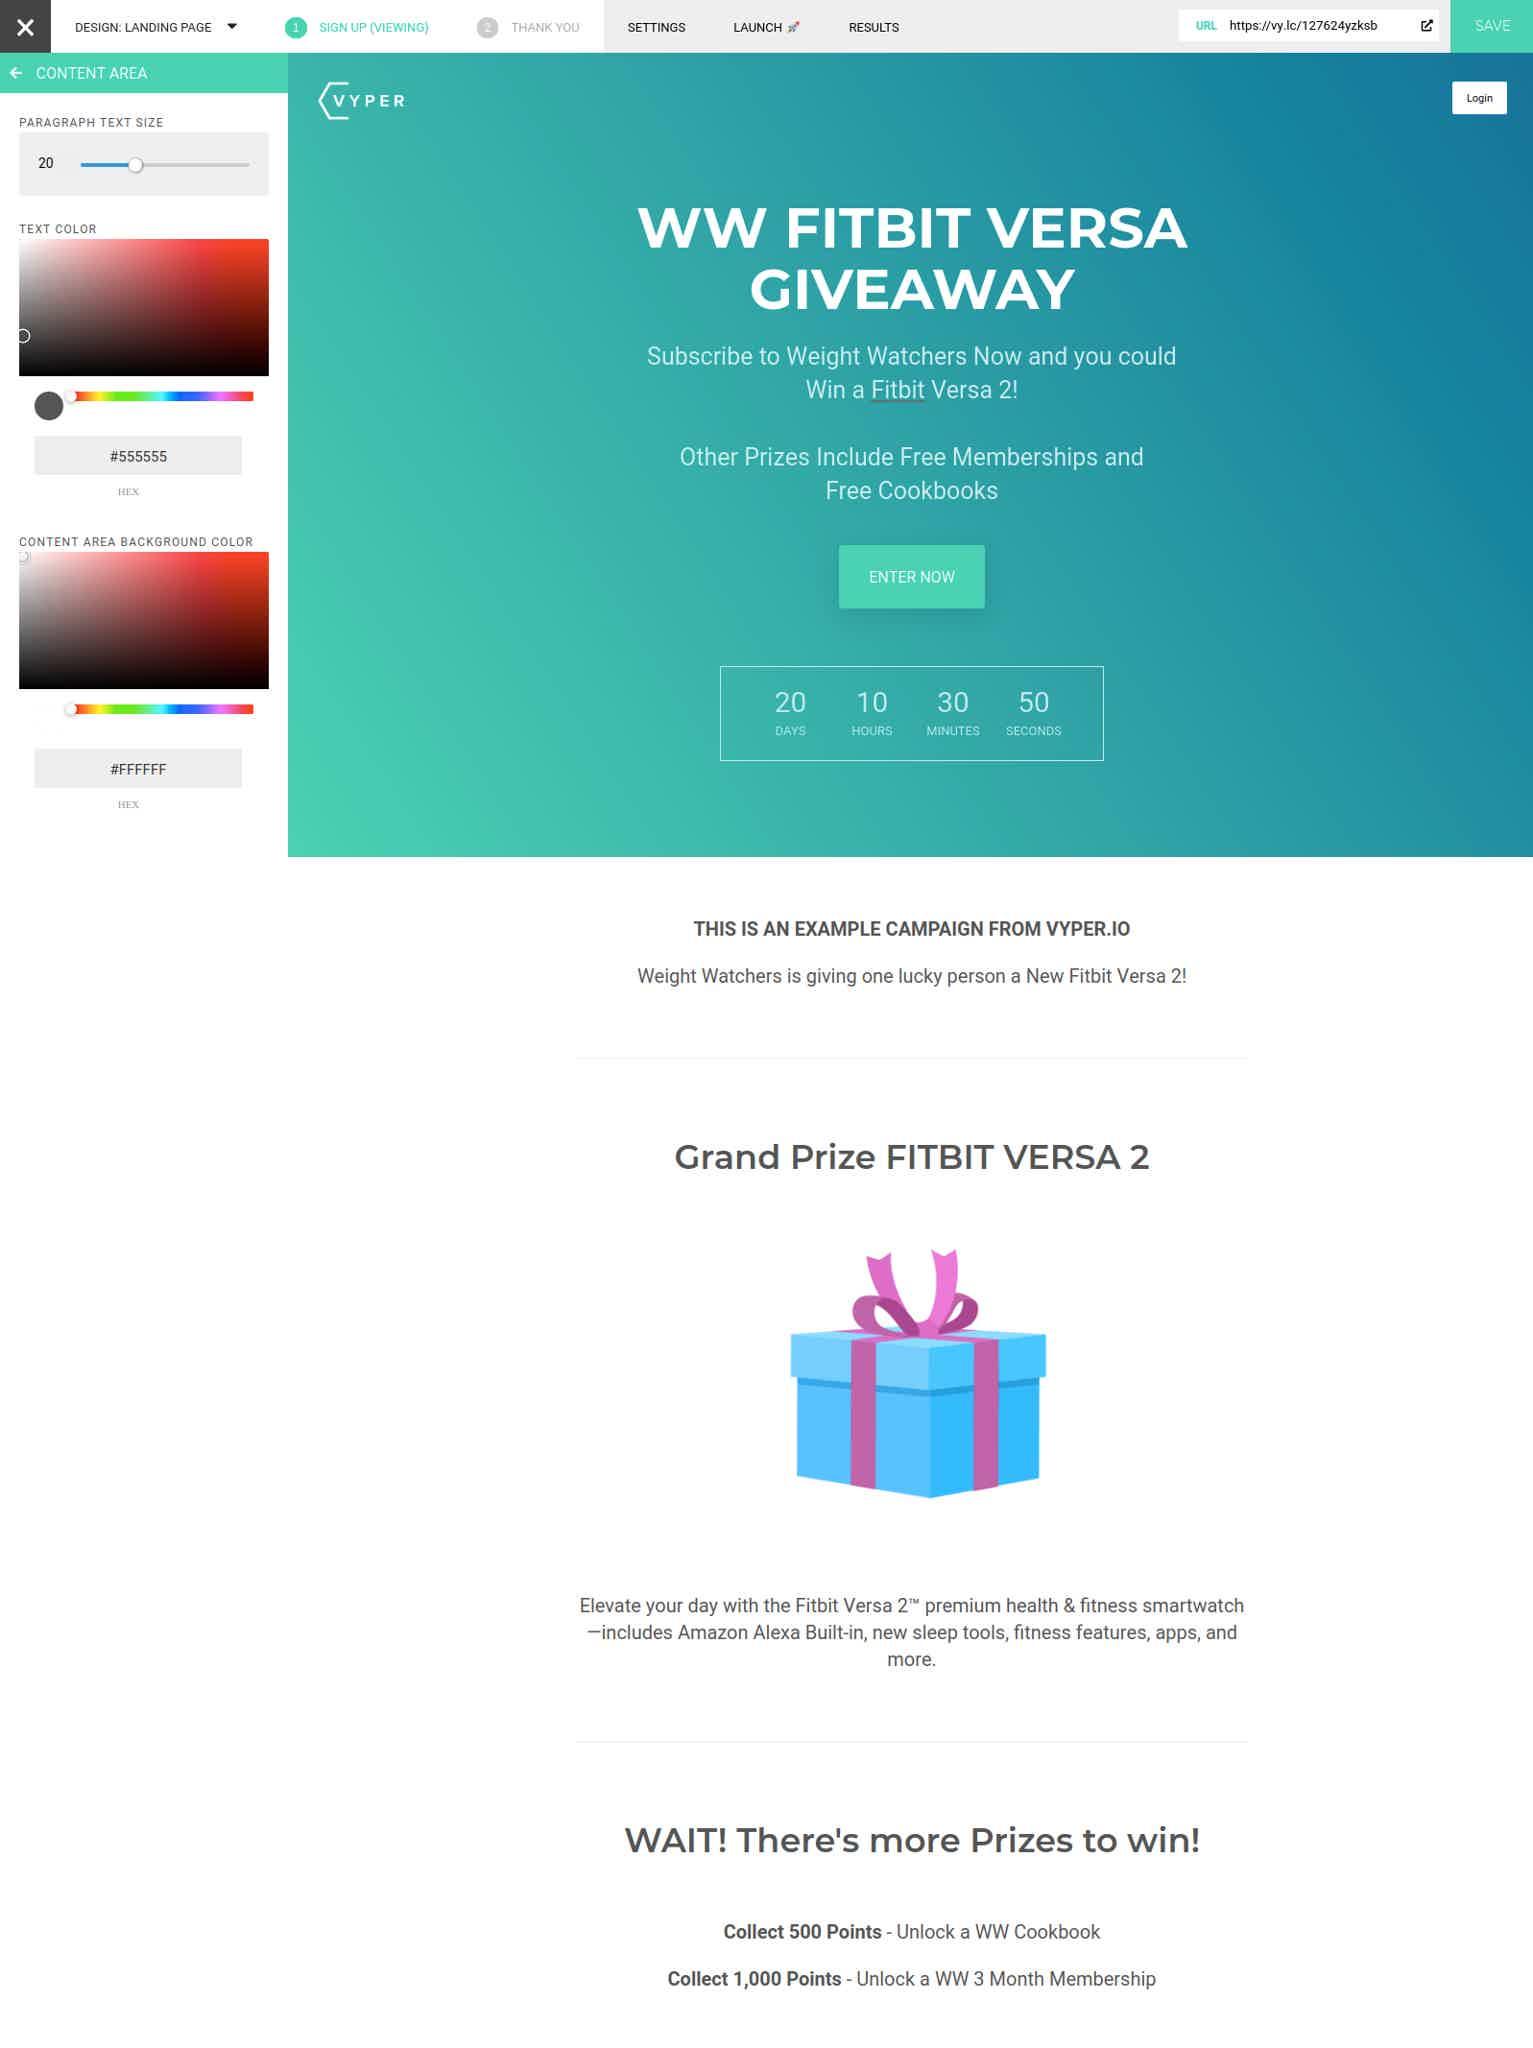 WW VYPER Giveaway Tutorial 01